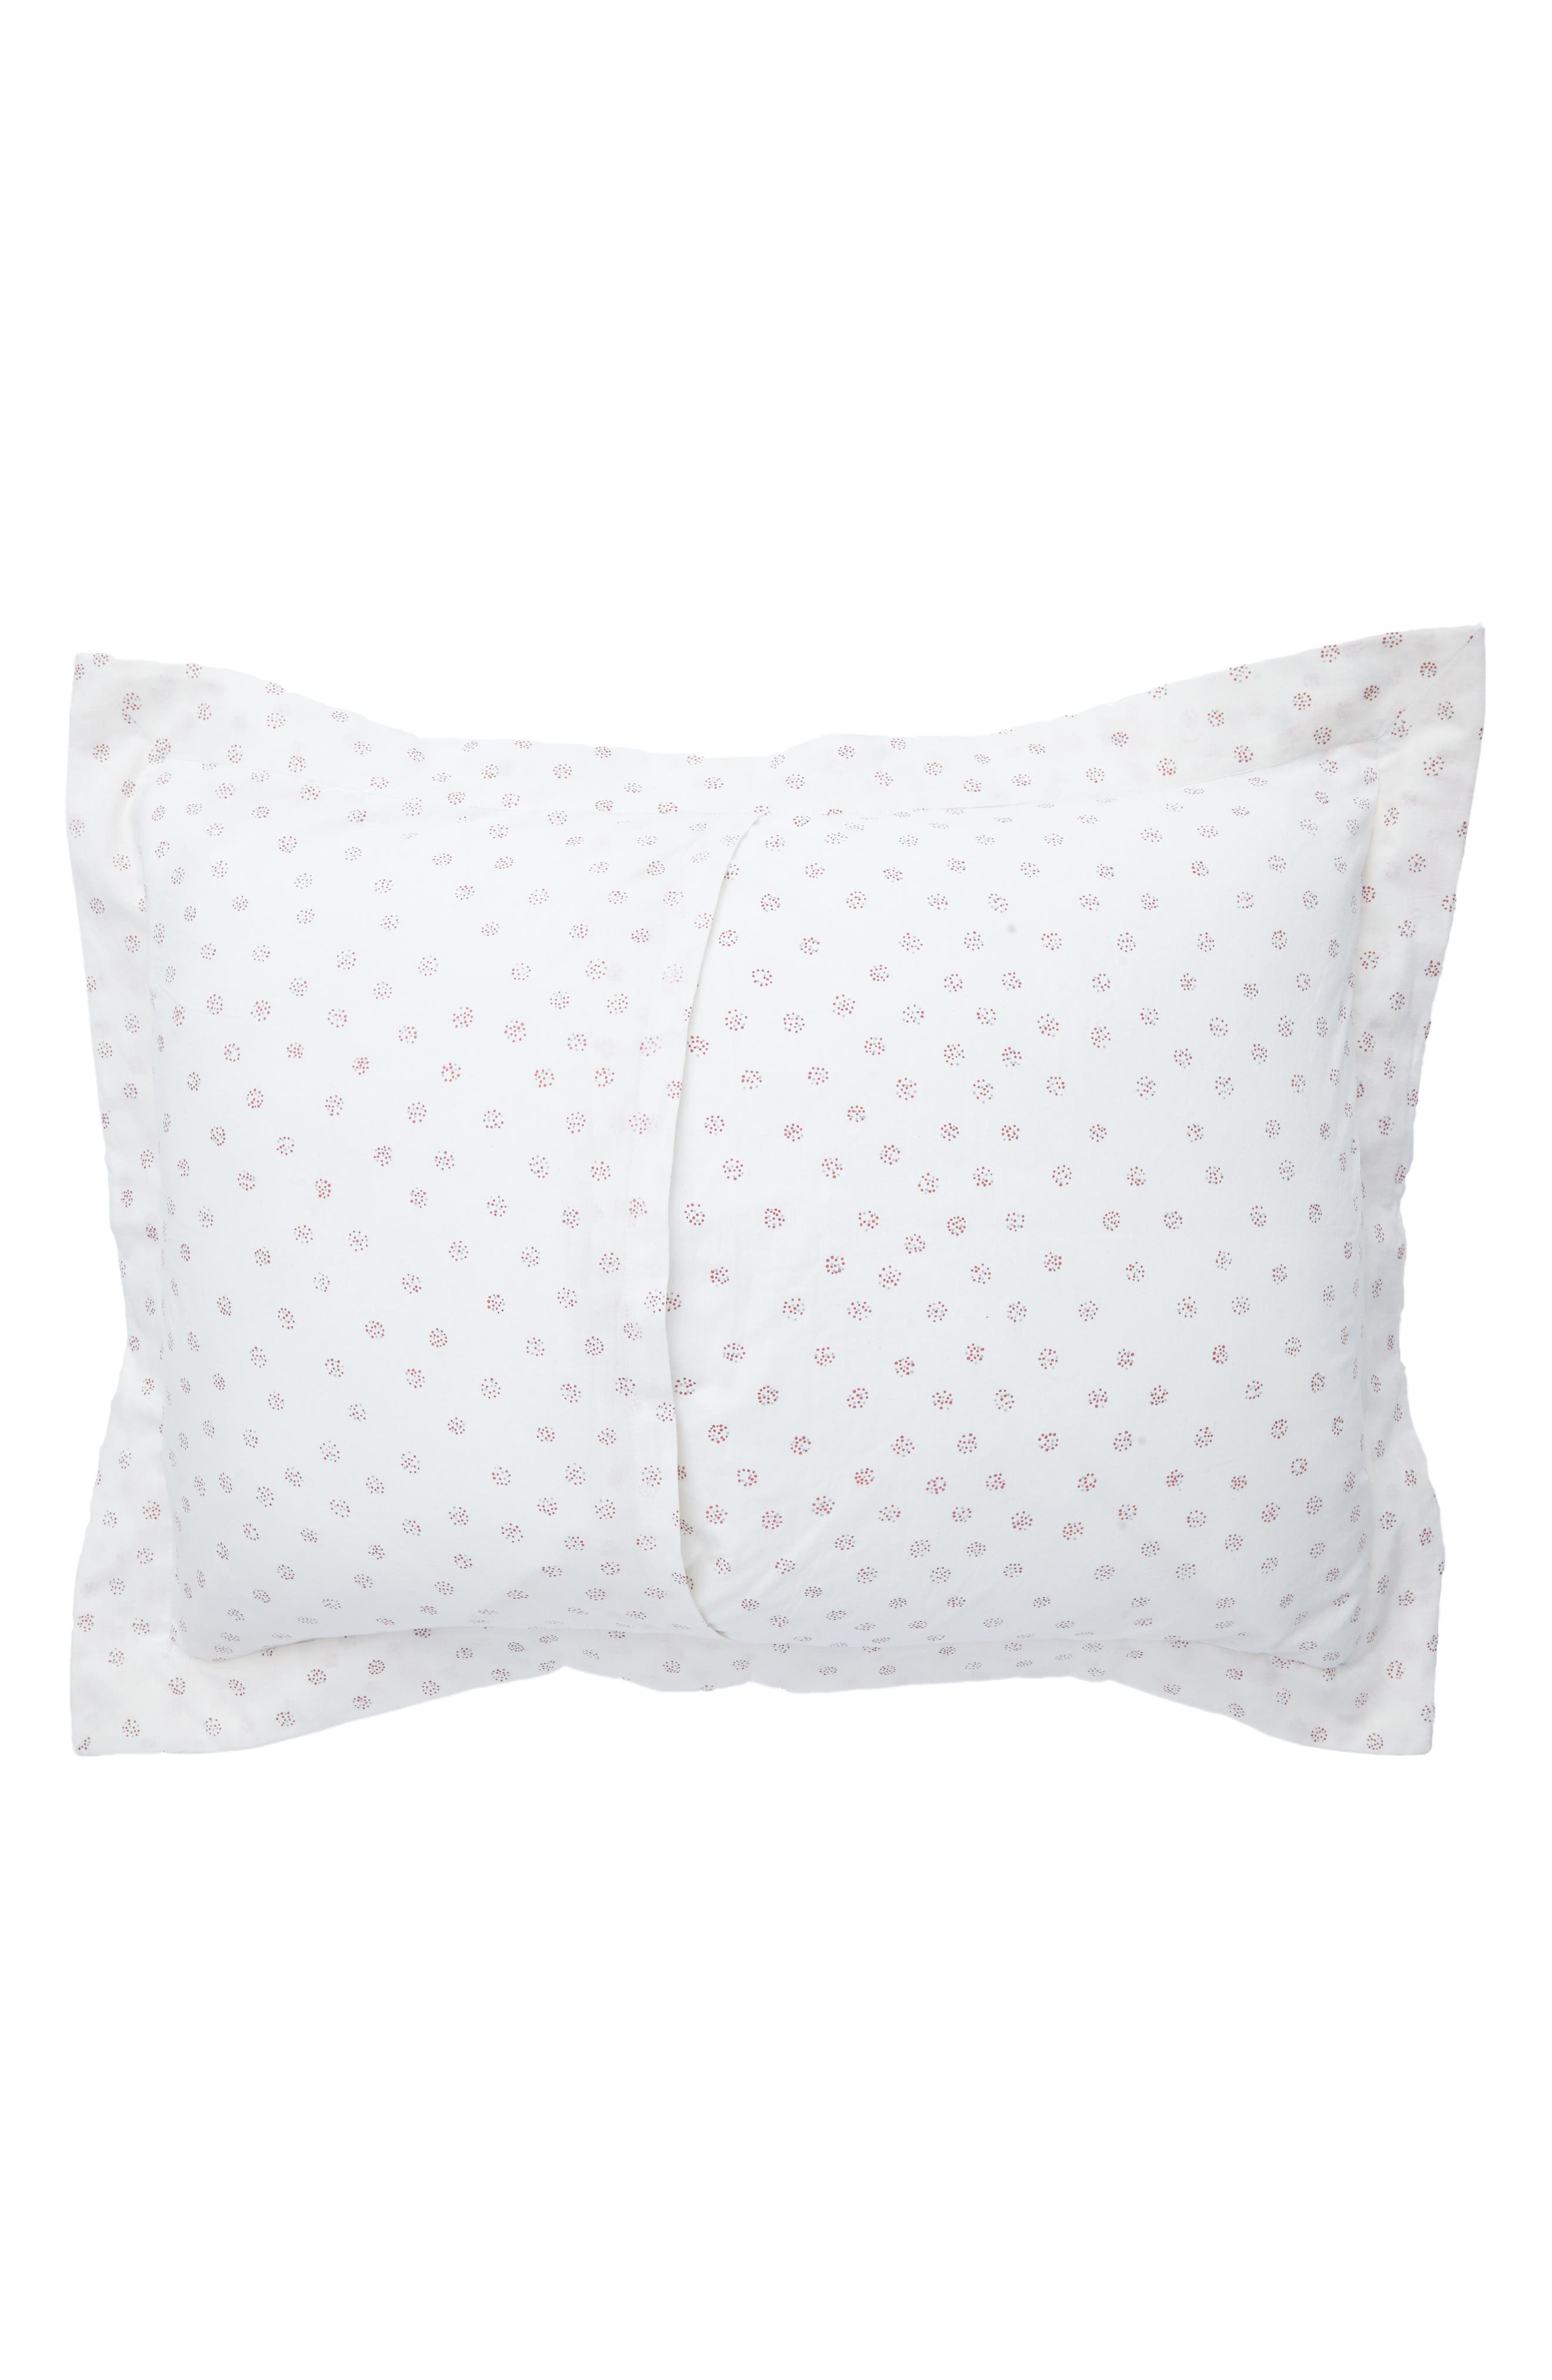 Reversible Standard Pillow Sham,                             Alternate thumbnail 2, color,                             650